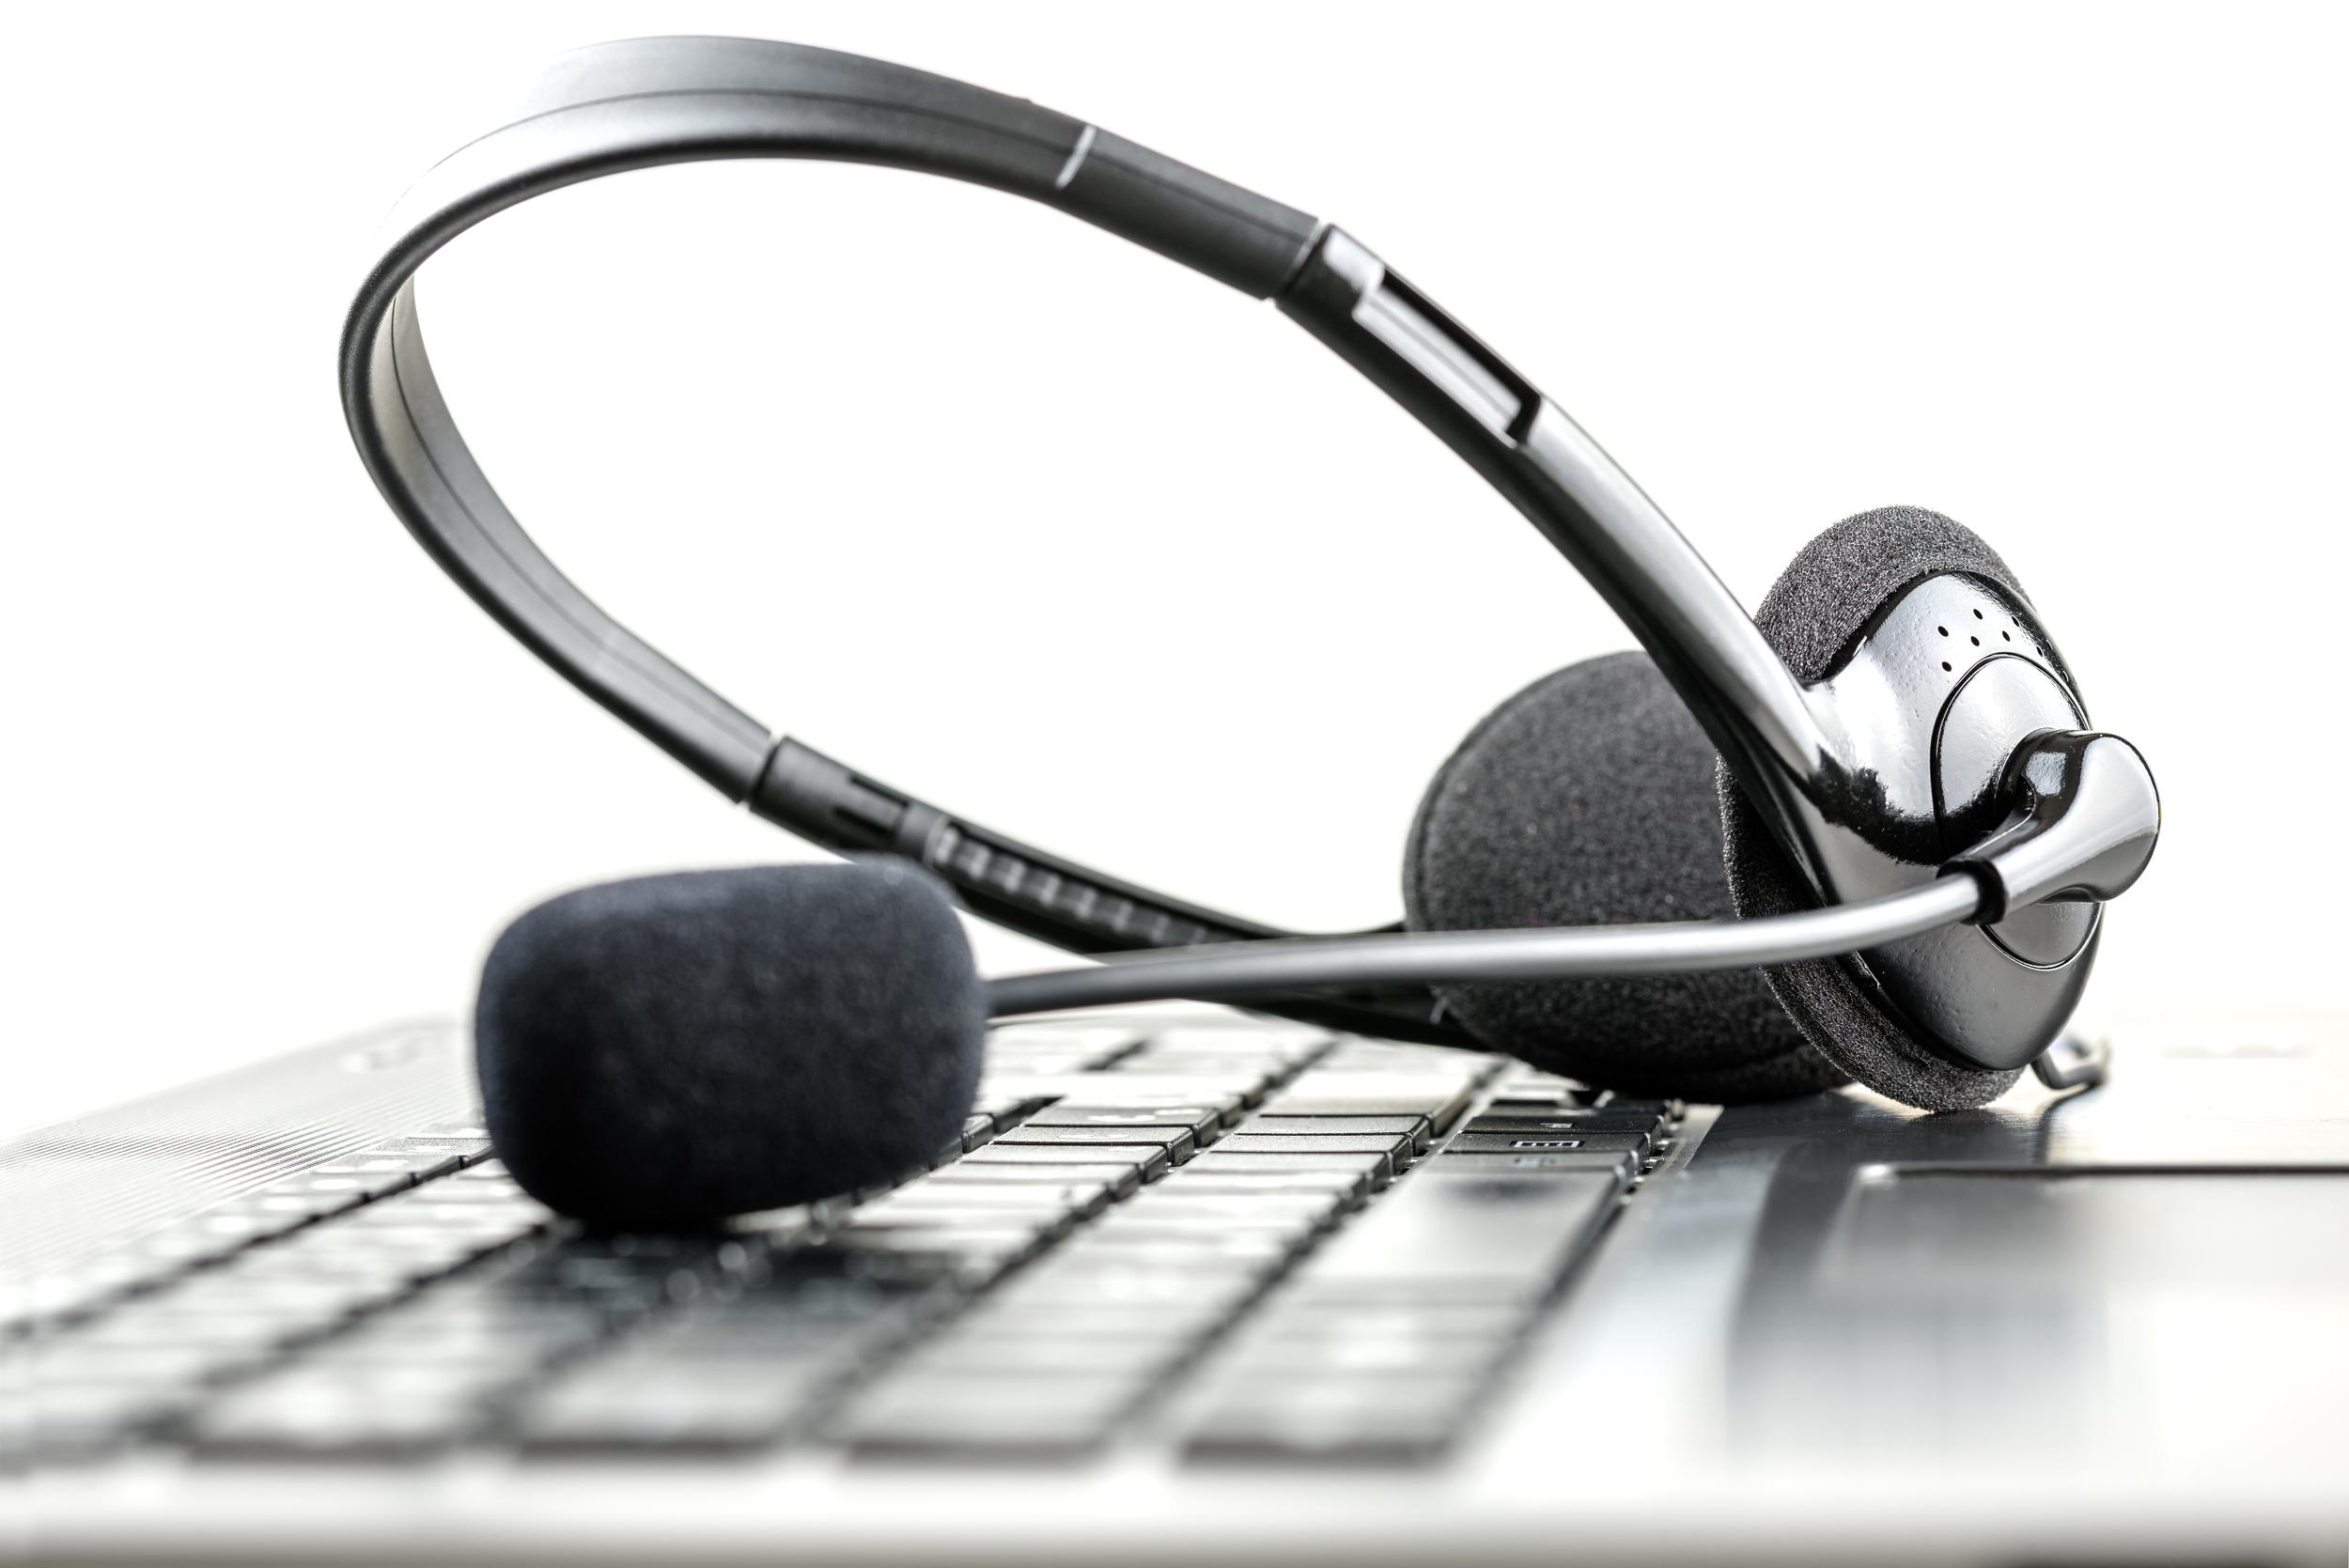 bigstock-Headset-On-A-Laptop-Computer-61846175.jpg